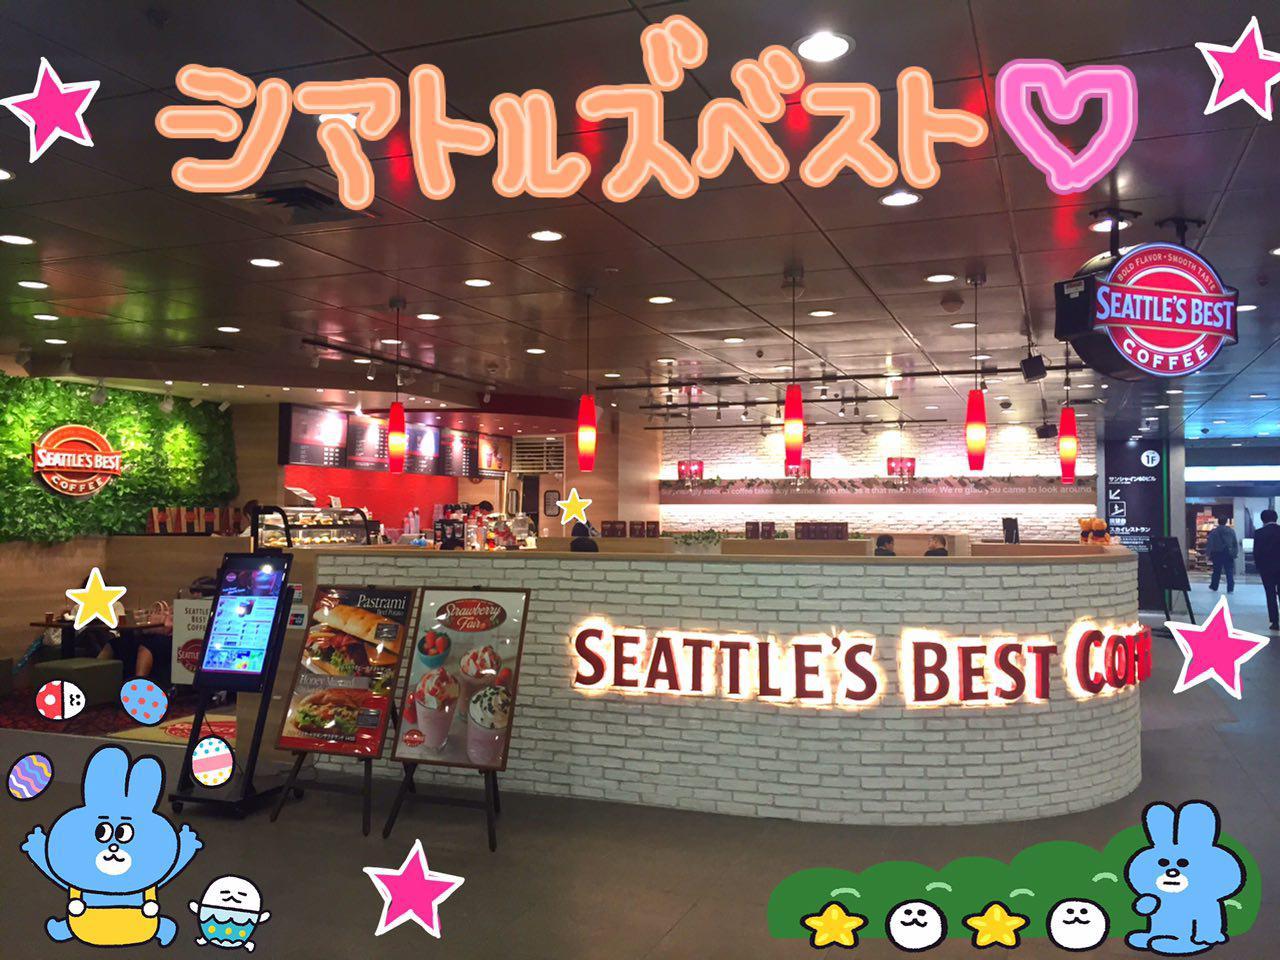 photo_2017-04-17_23-41-52.jpg